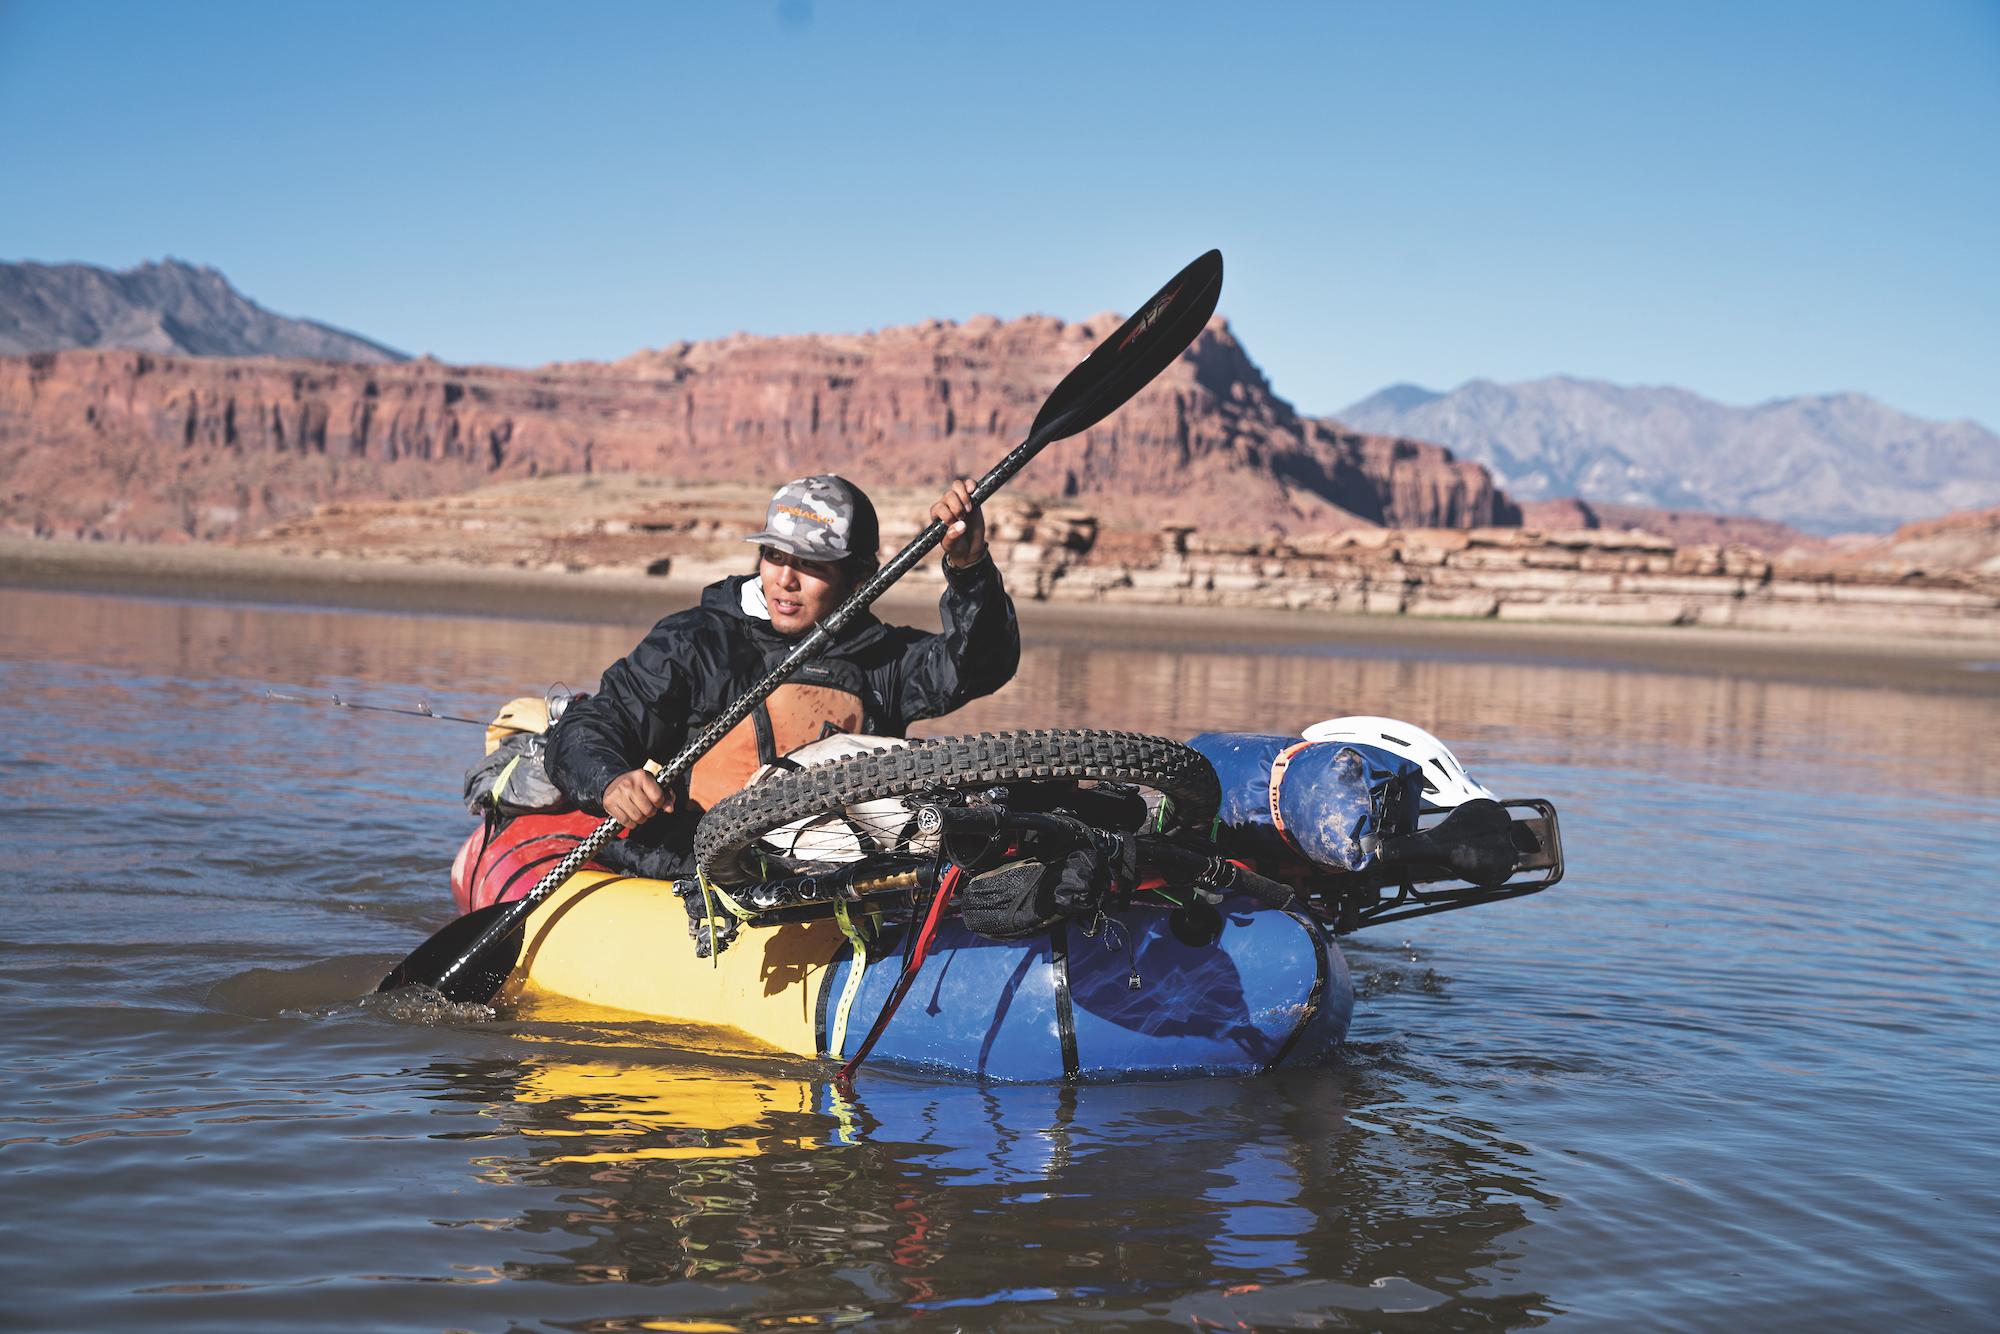 Jaron Segay bikerafting Lake Powell. Learn to bikeraft in the Glen Canyon National Recreation Area.